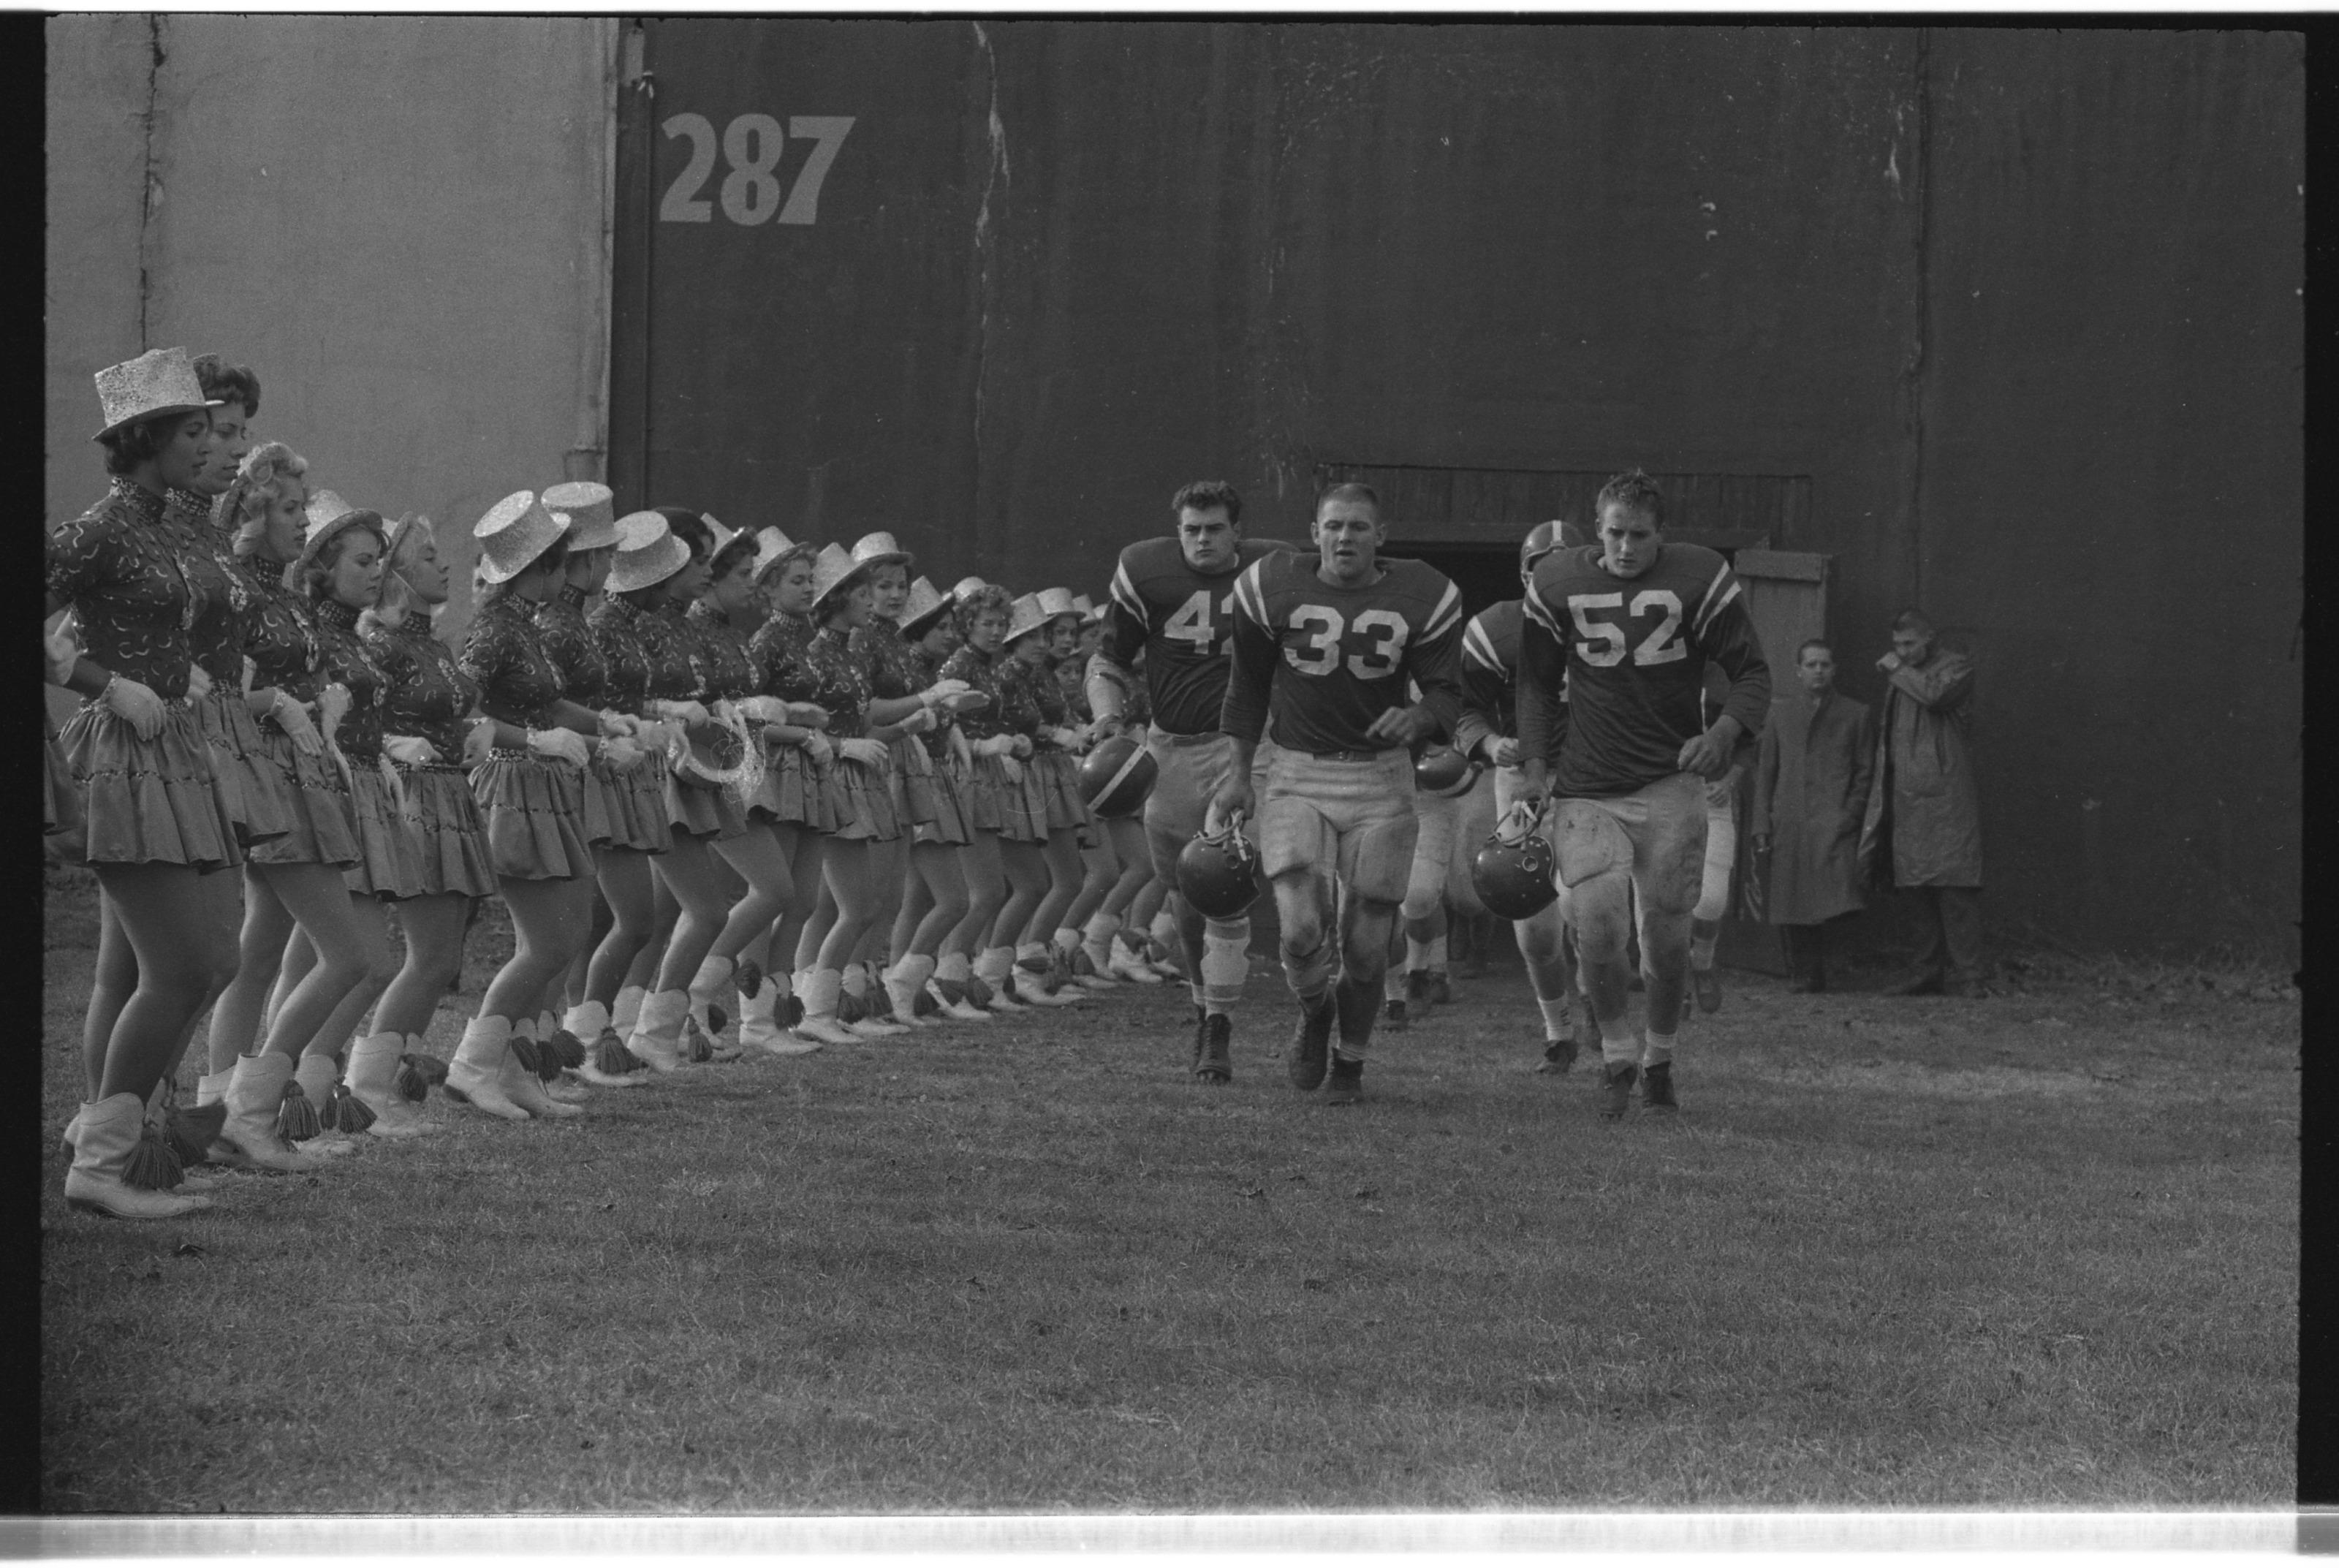 Football players enter stadium, running past Sparkettes